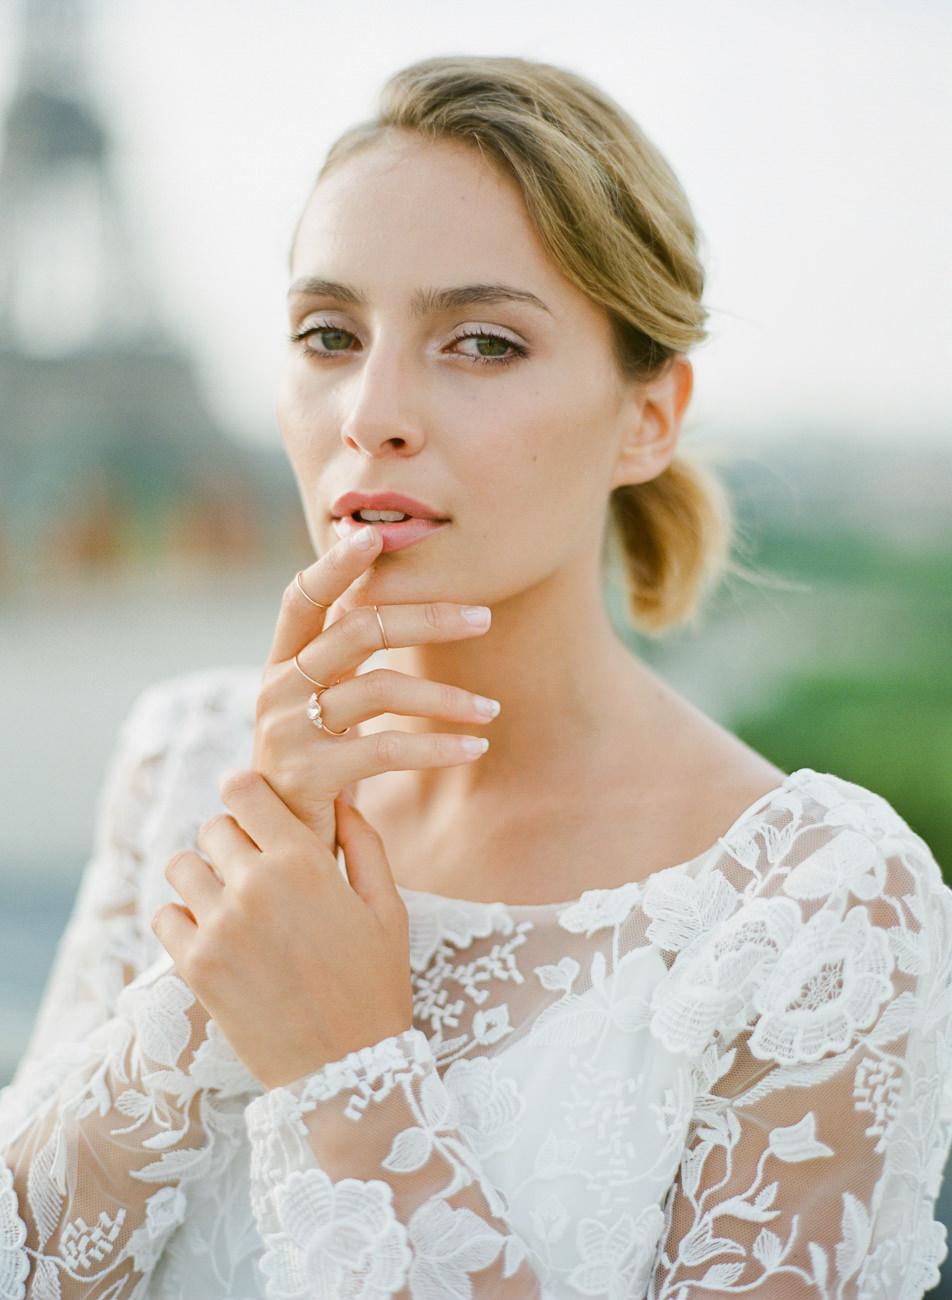 toits-paris-photographe-mariage-alain-m-9.jpg